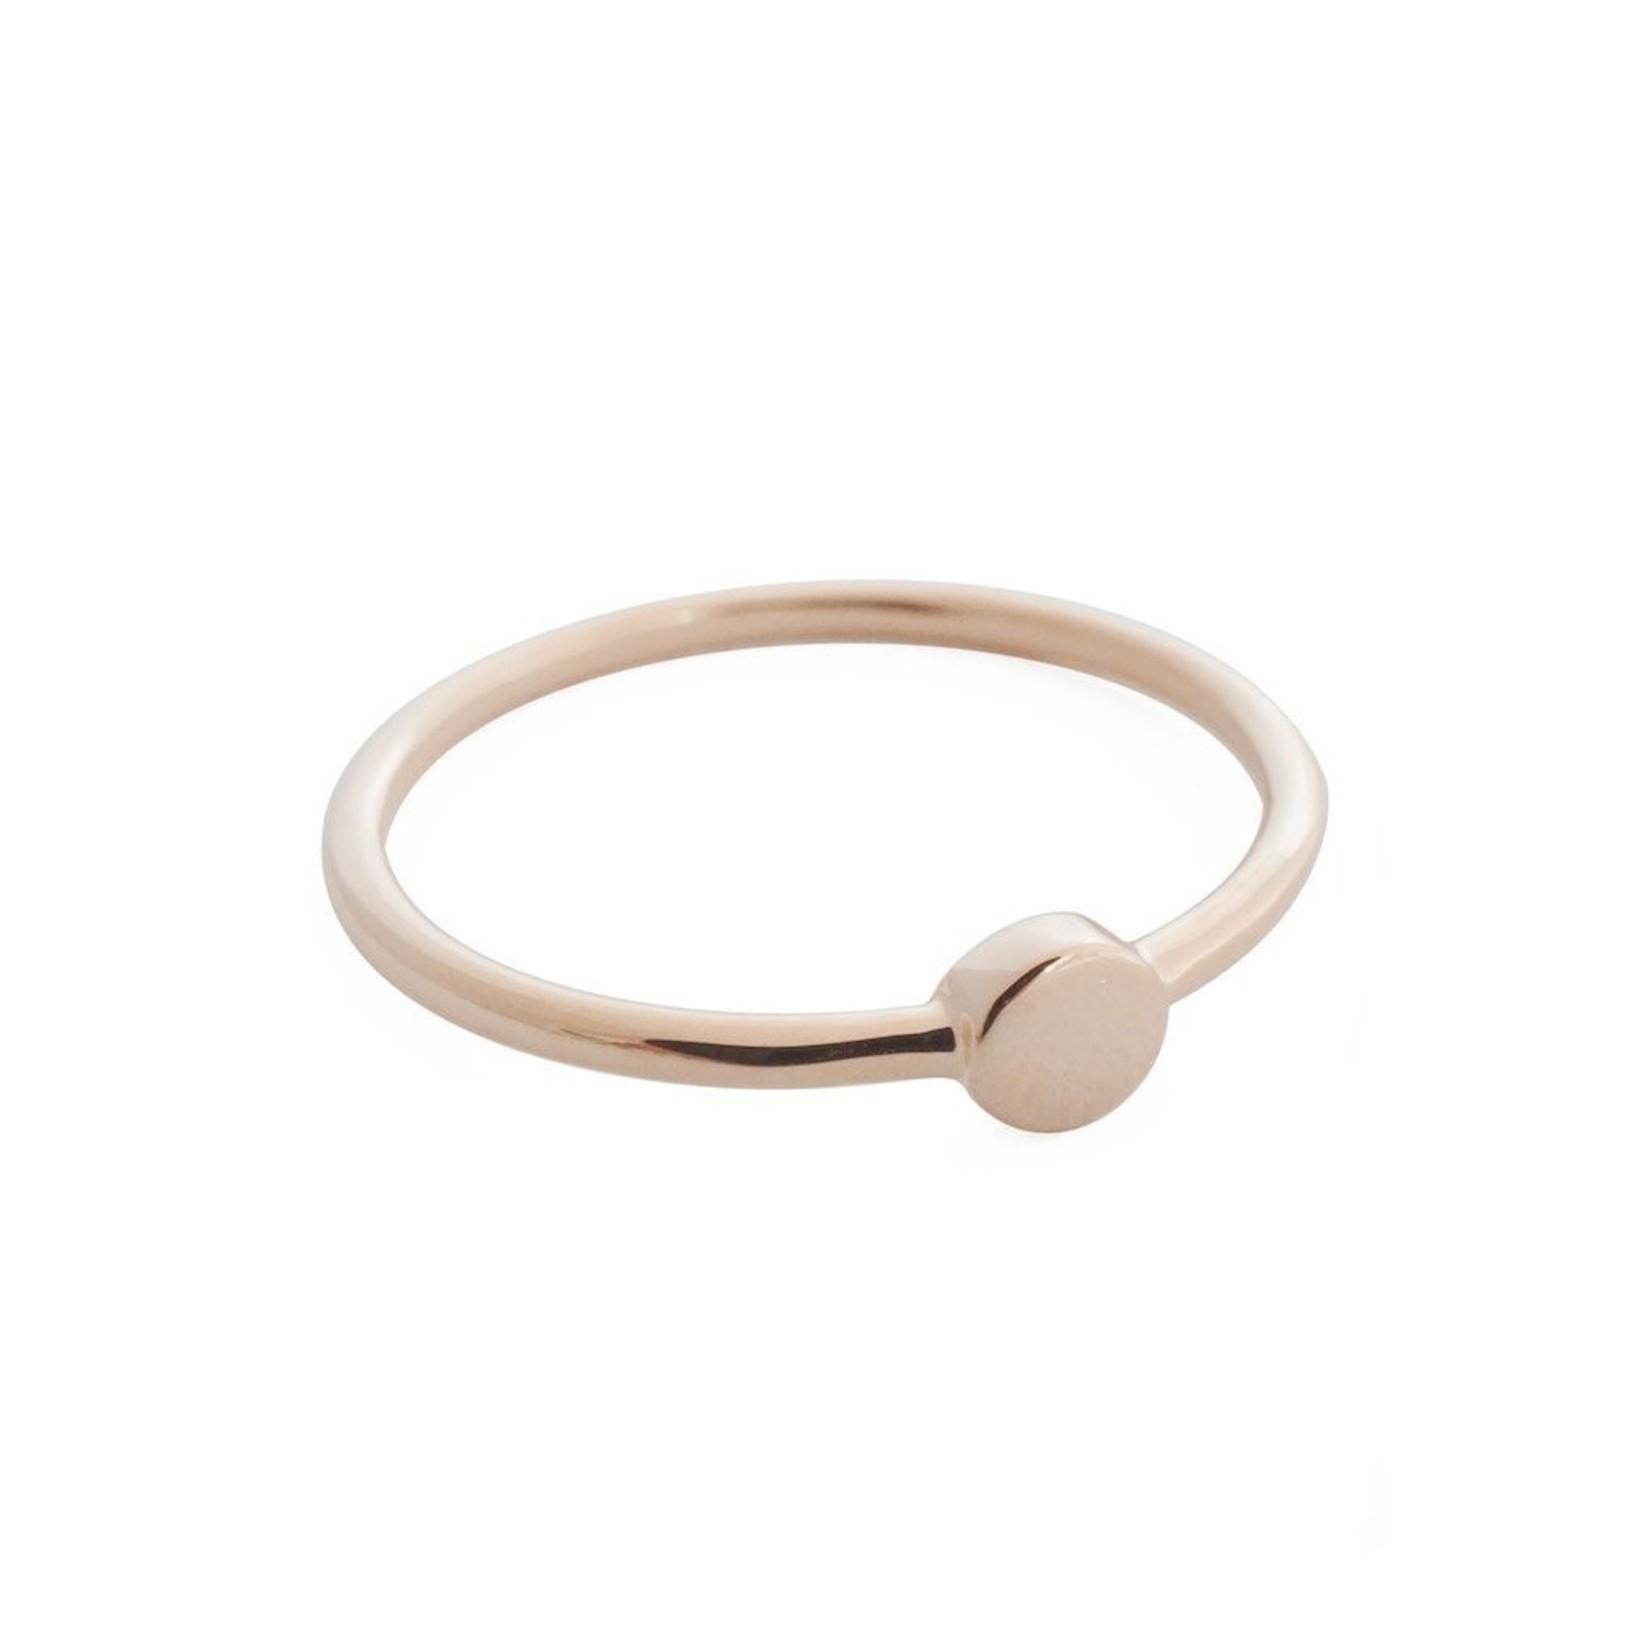 Honeycat Jewelry Tiny Circle Ring  by Honeycat Jewelry